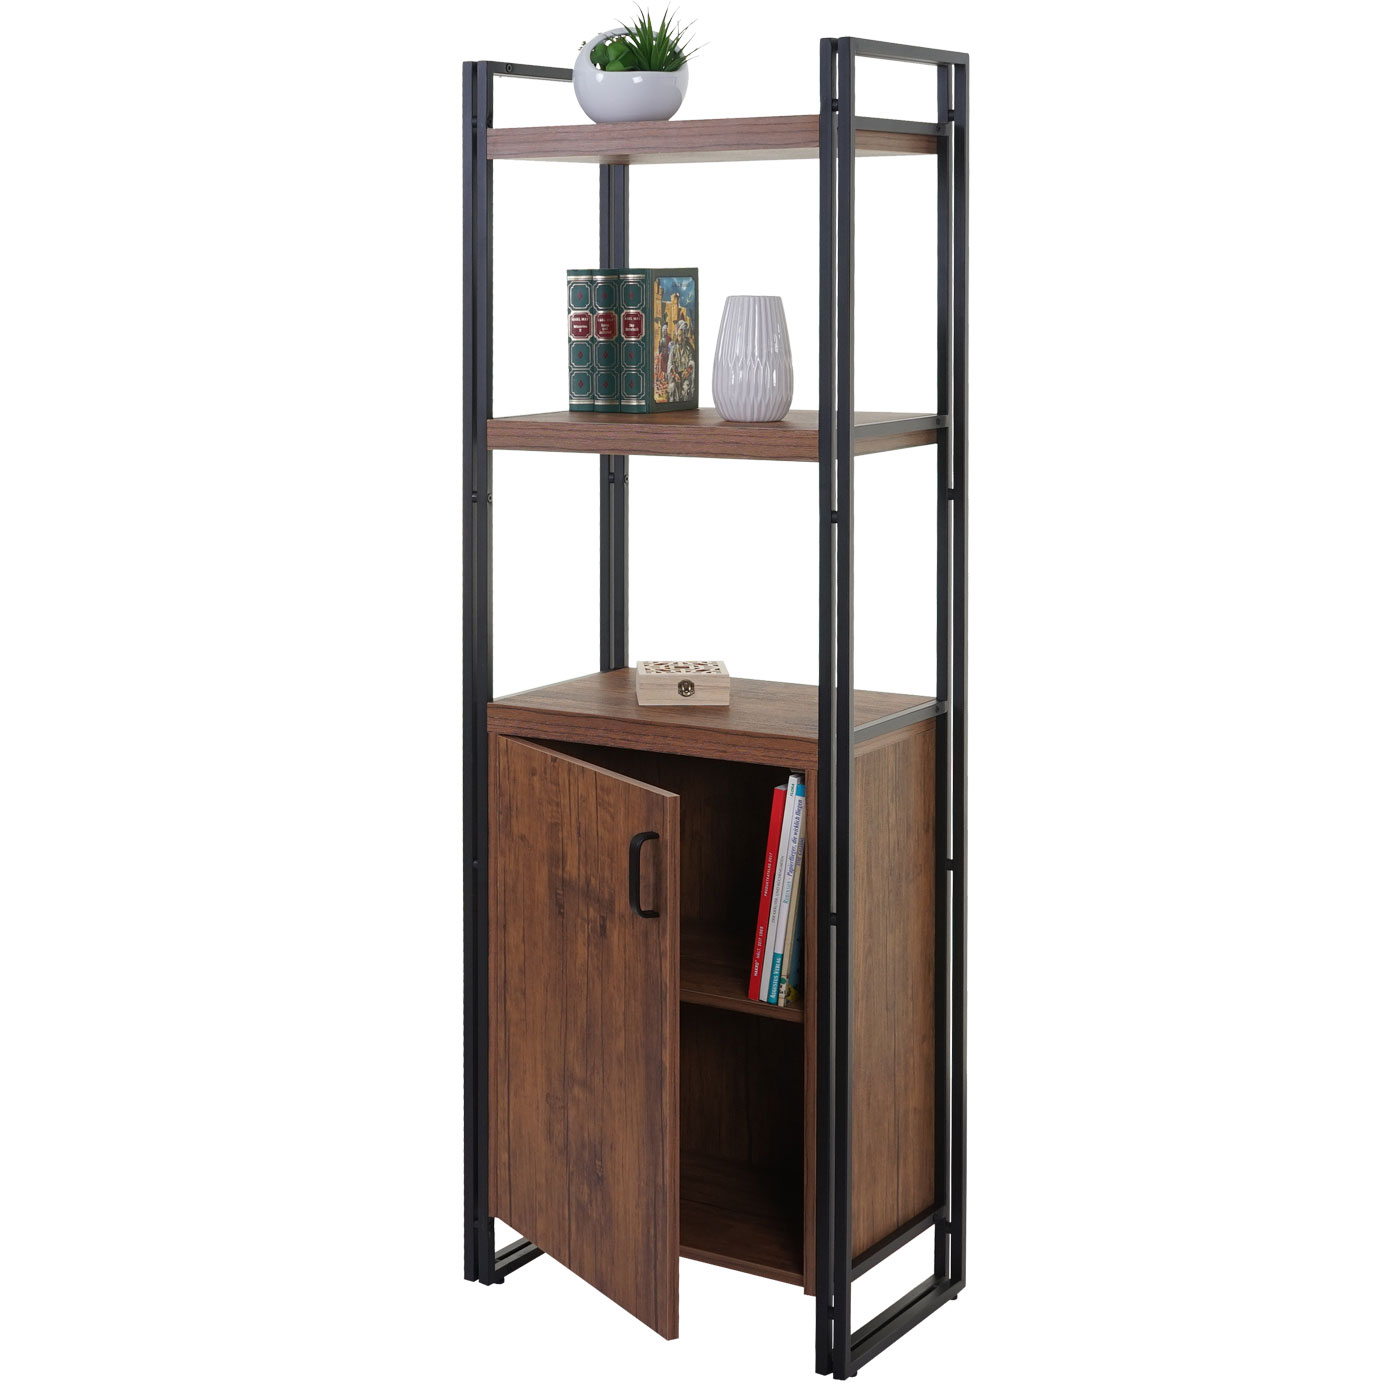 b cherregal hwc a27 regal standregal wohnregal staufach mit t r 165x55cm 3d struktur wildeiche. Black Bedroom Furniture Sets. Home Design Ideas